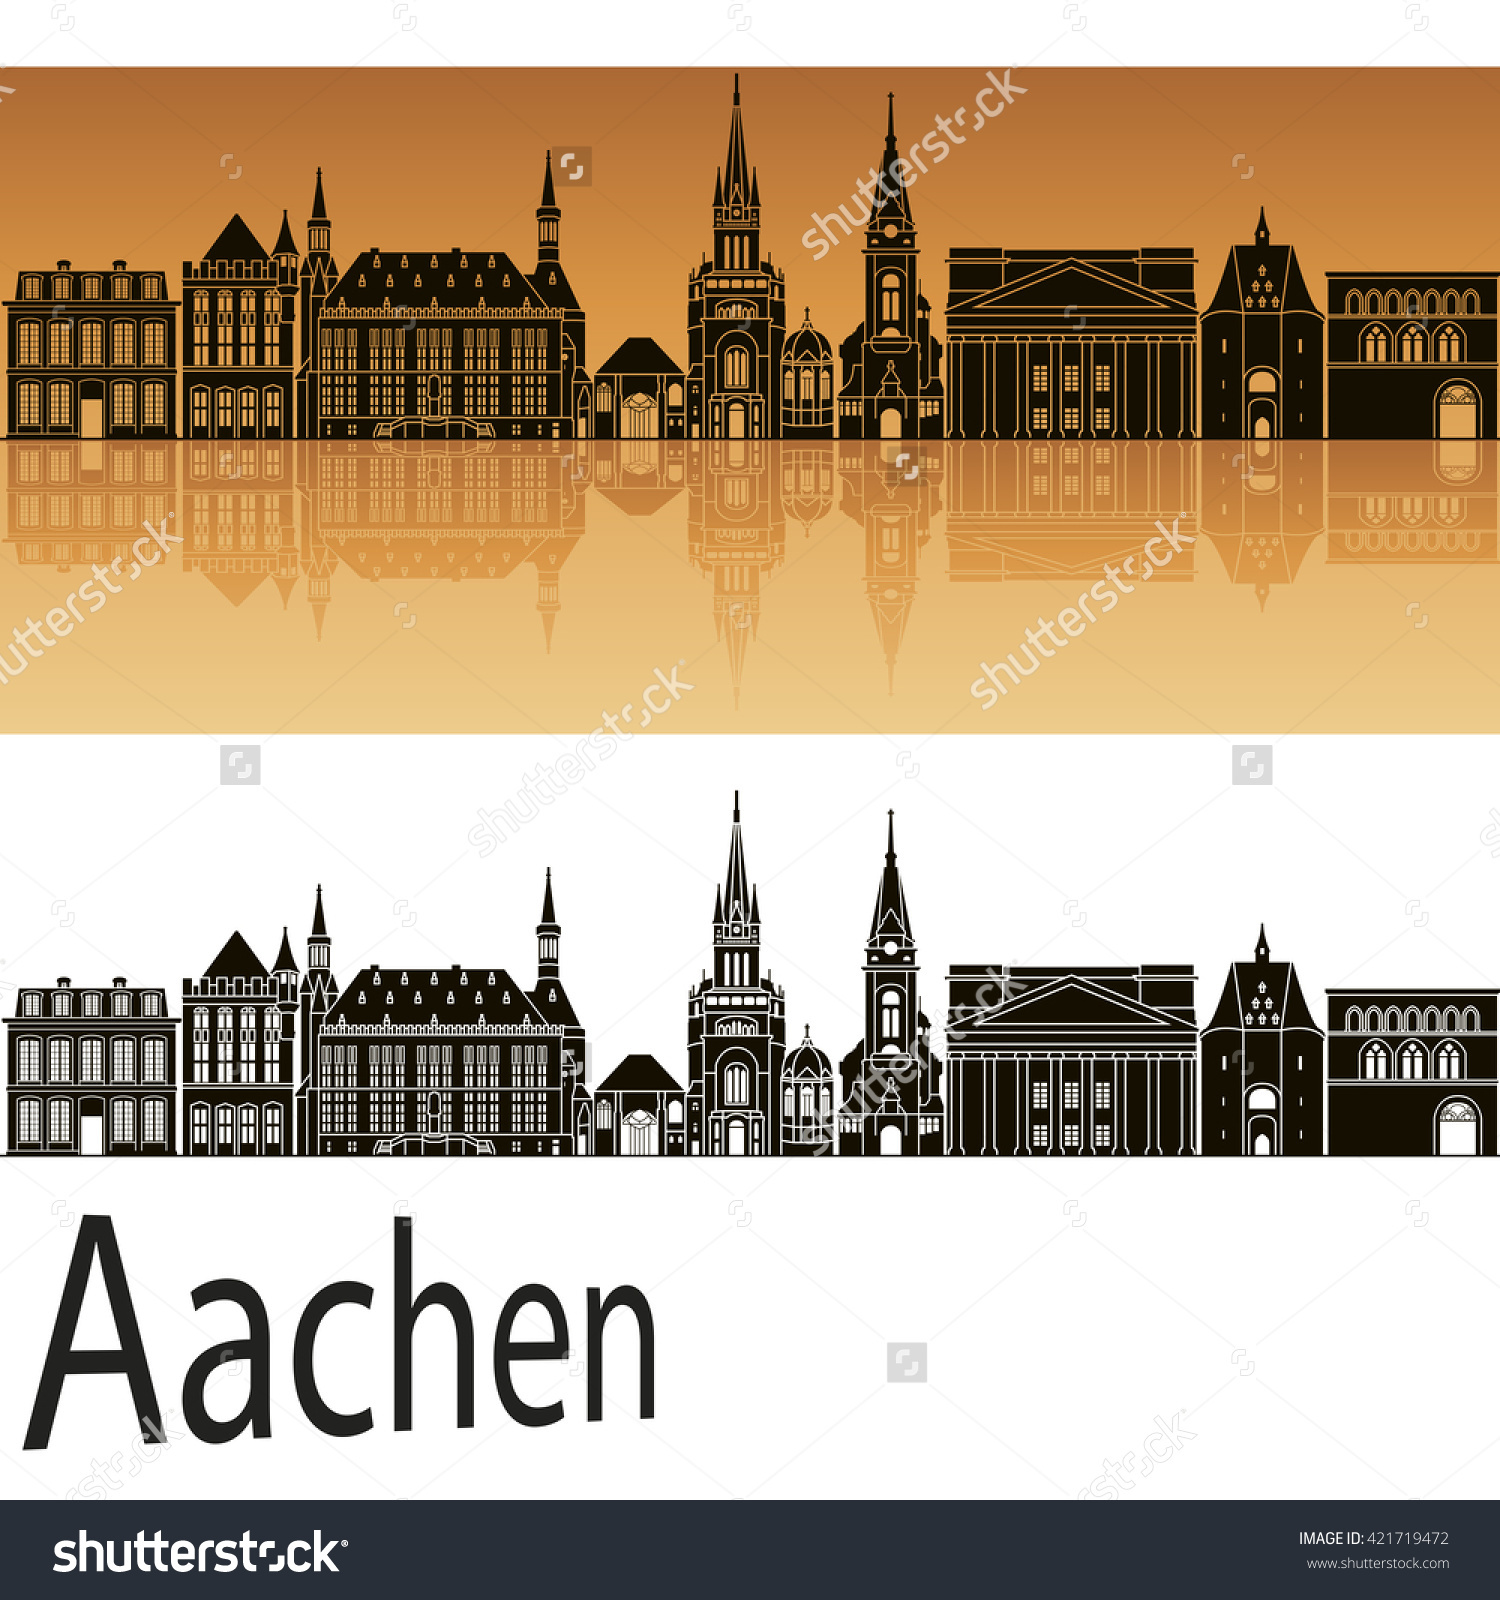 Aachen Skyline Orange Background Editable Vector Stock Vector.